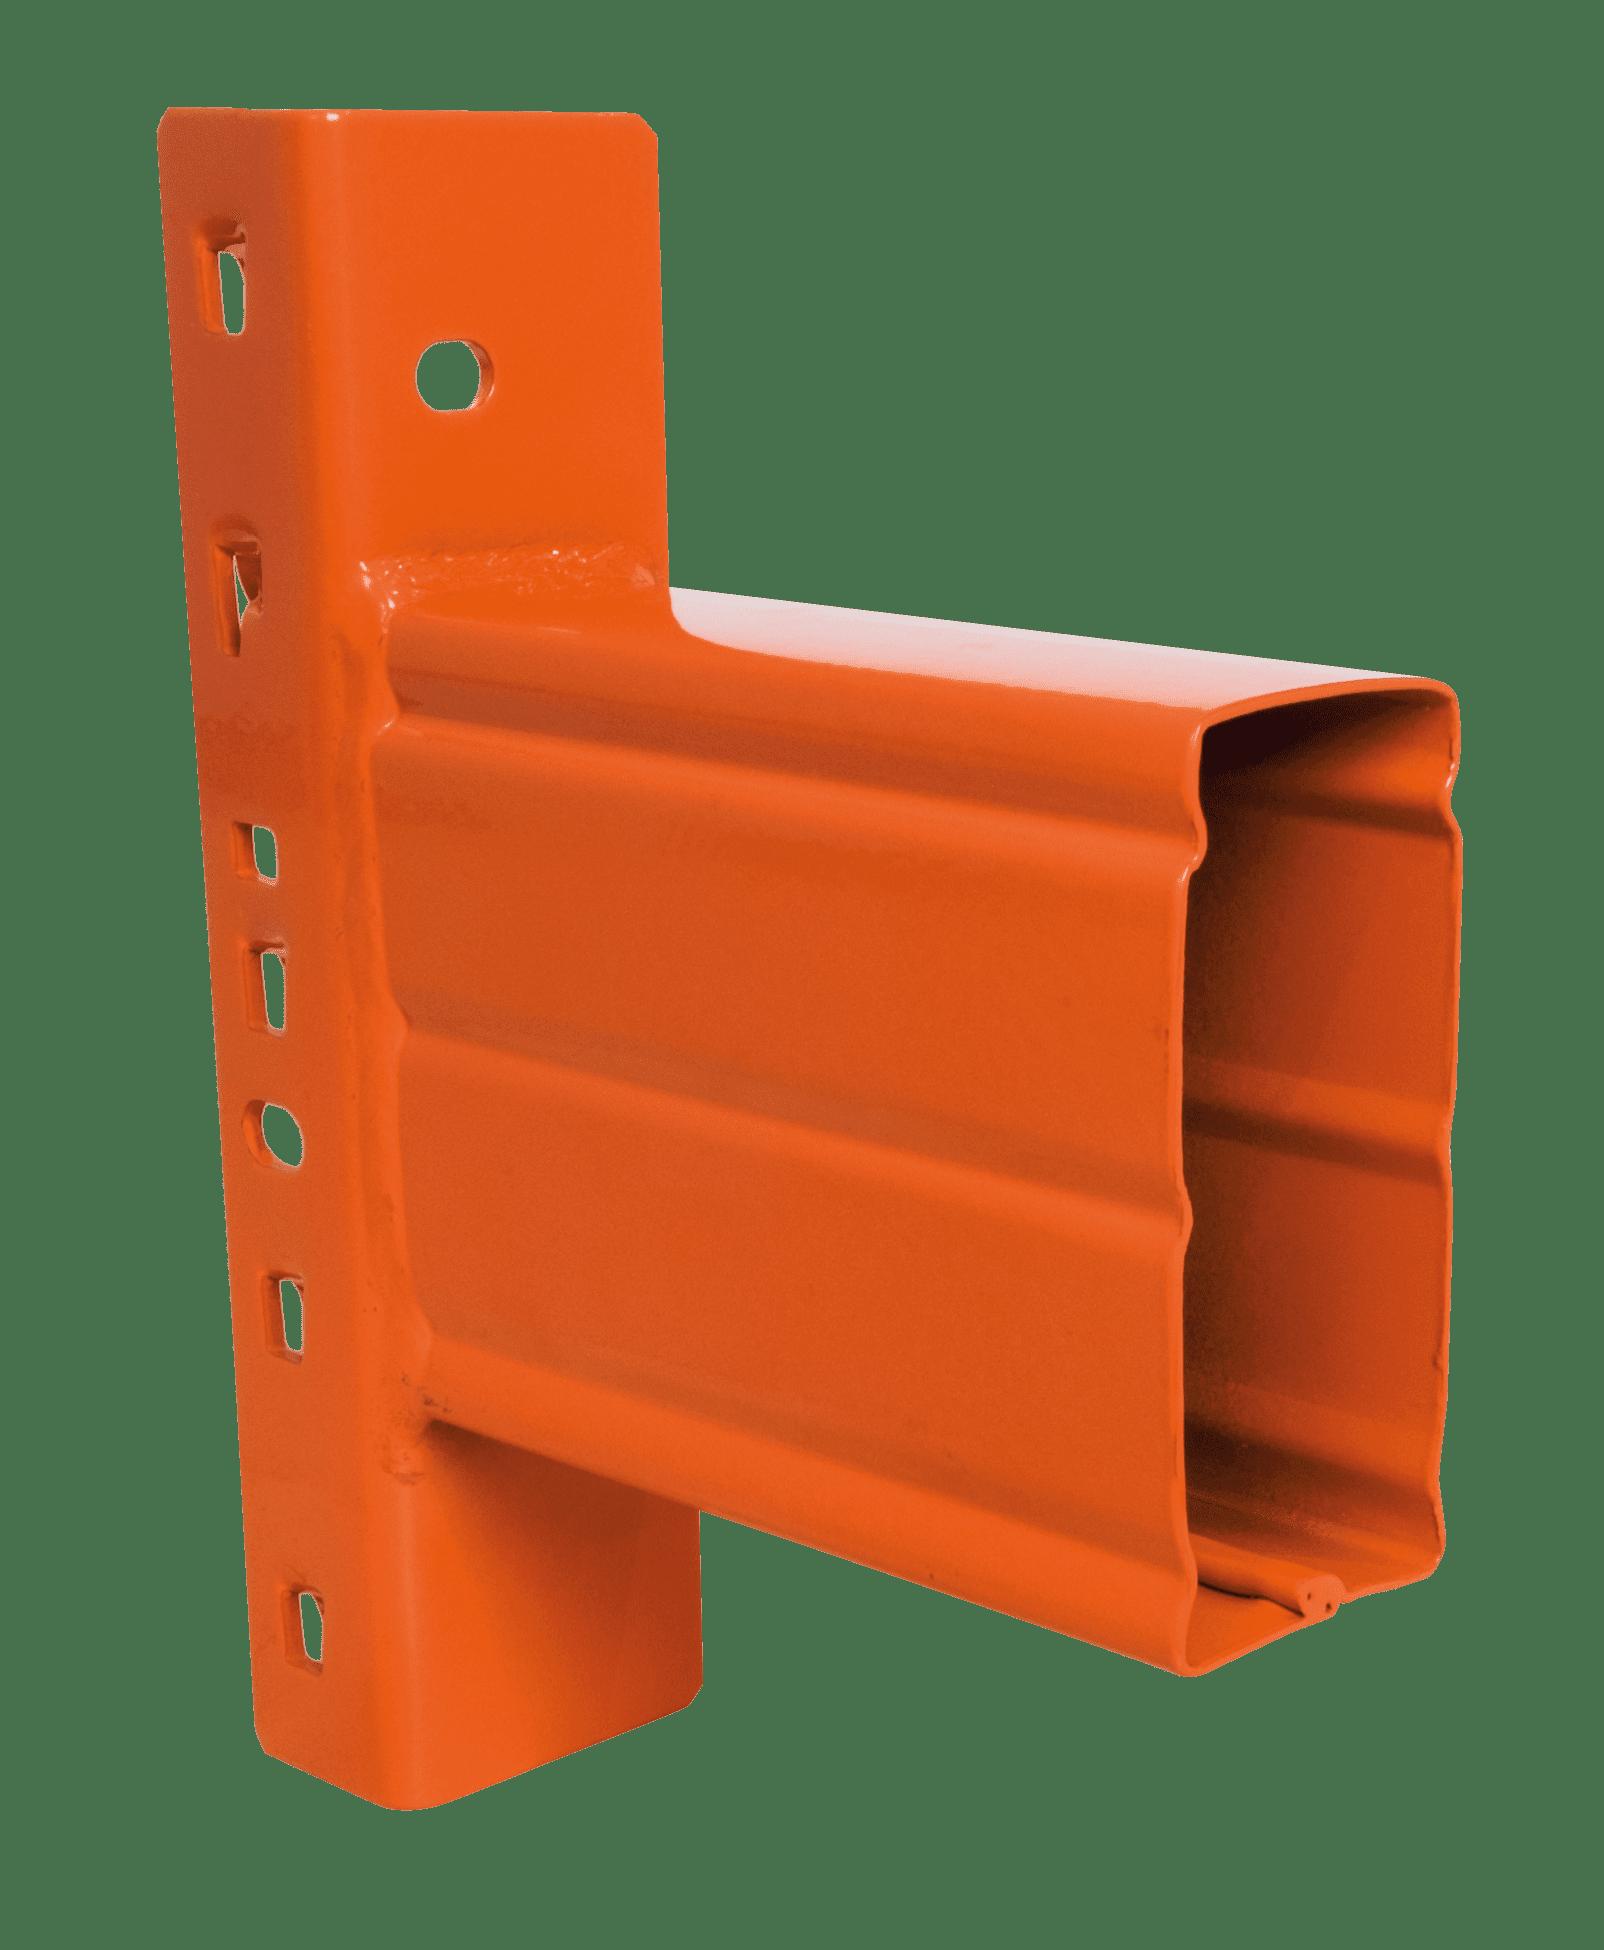 Palettenregal Holmpaar EGN-DUO165x50x1,8x3900mm – Belastbarkeit 3935 kg/Paar SCHULTE Lagertechnik